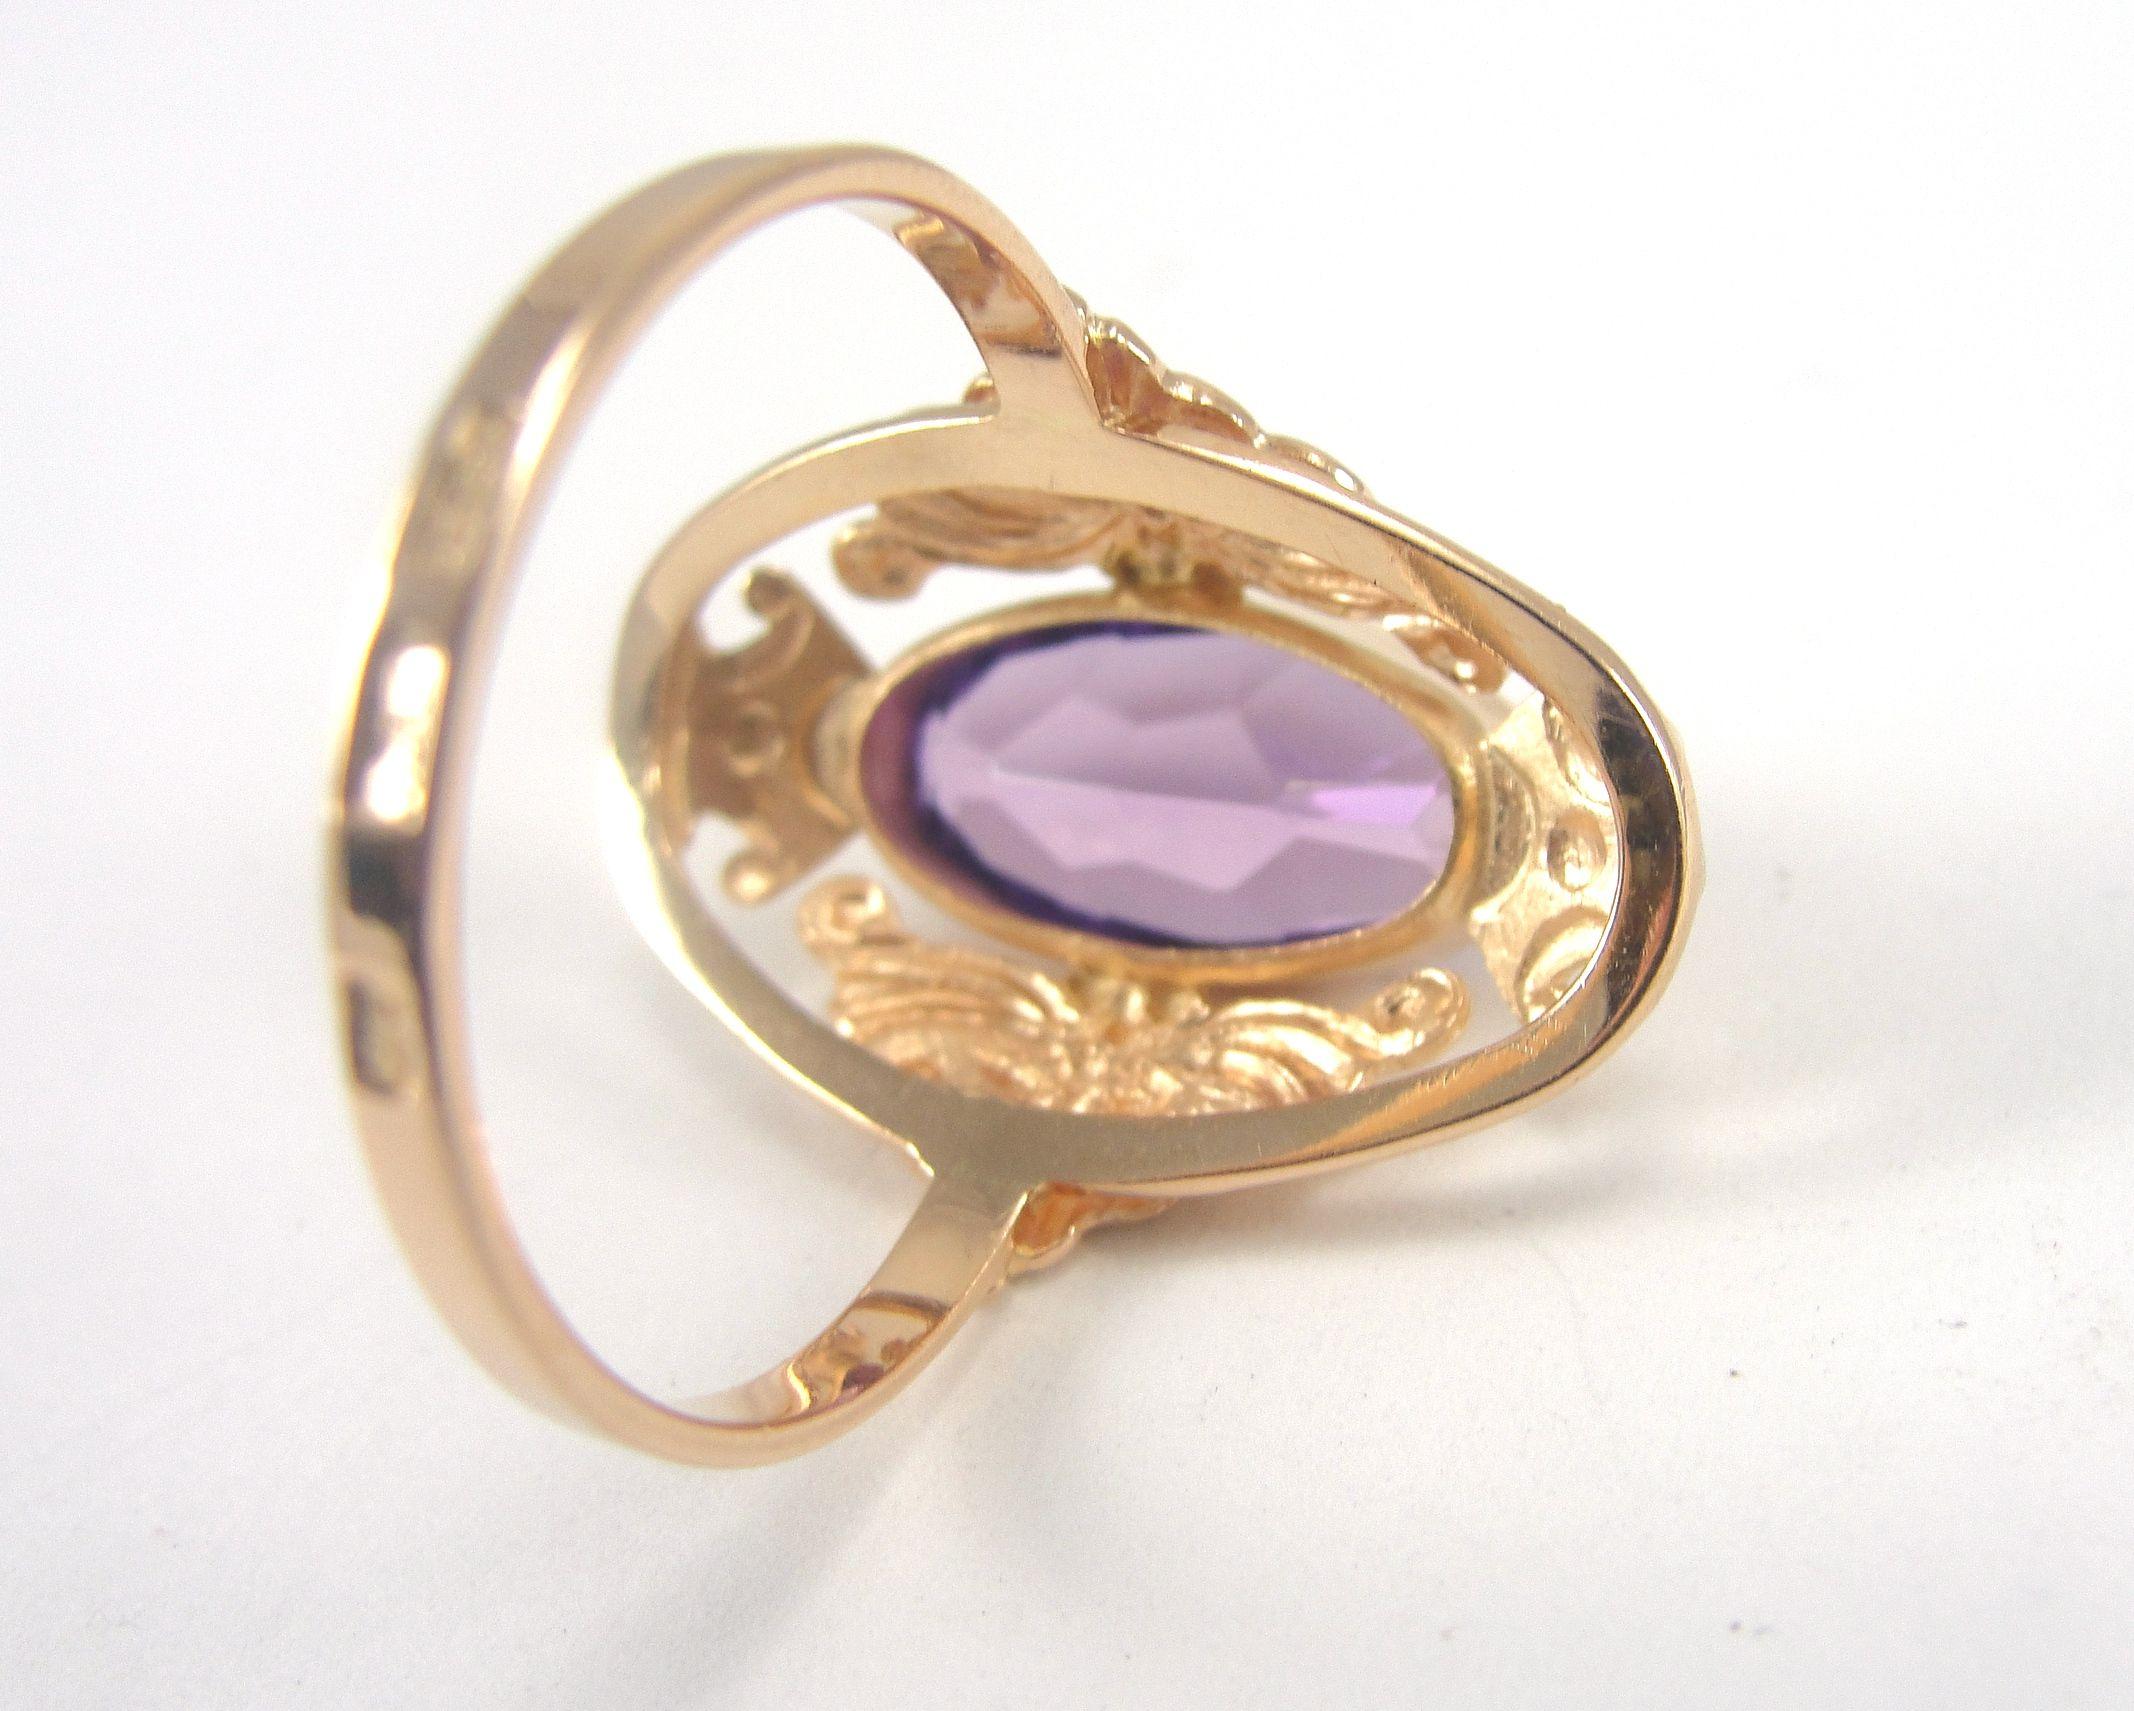 14K Rose Gold Ring Amethyst Russian Soviet Union Era Size 10